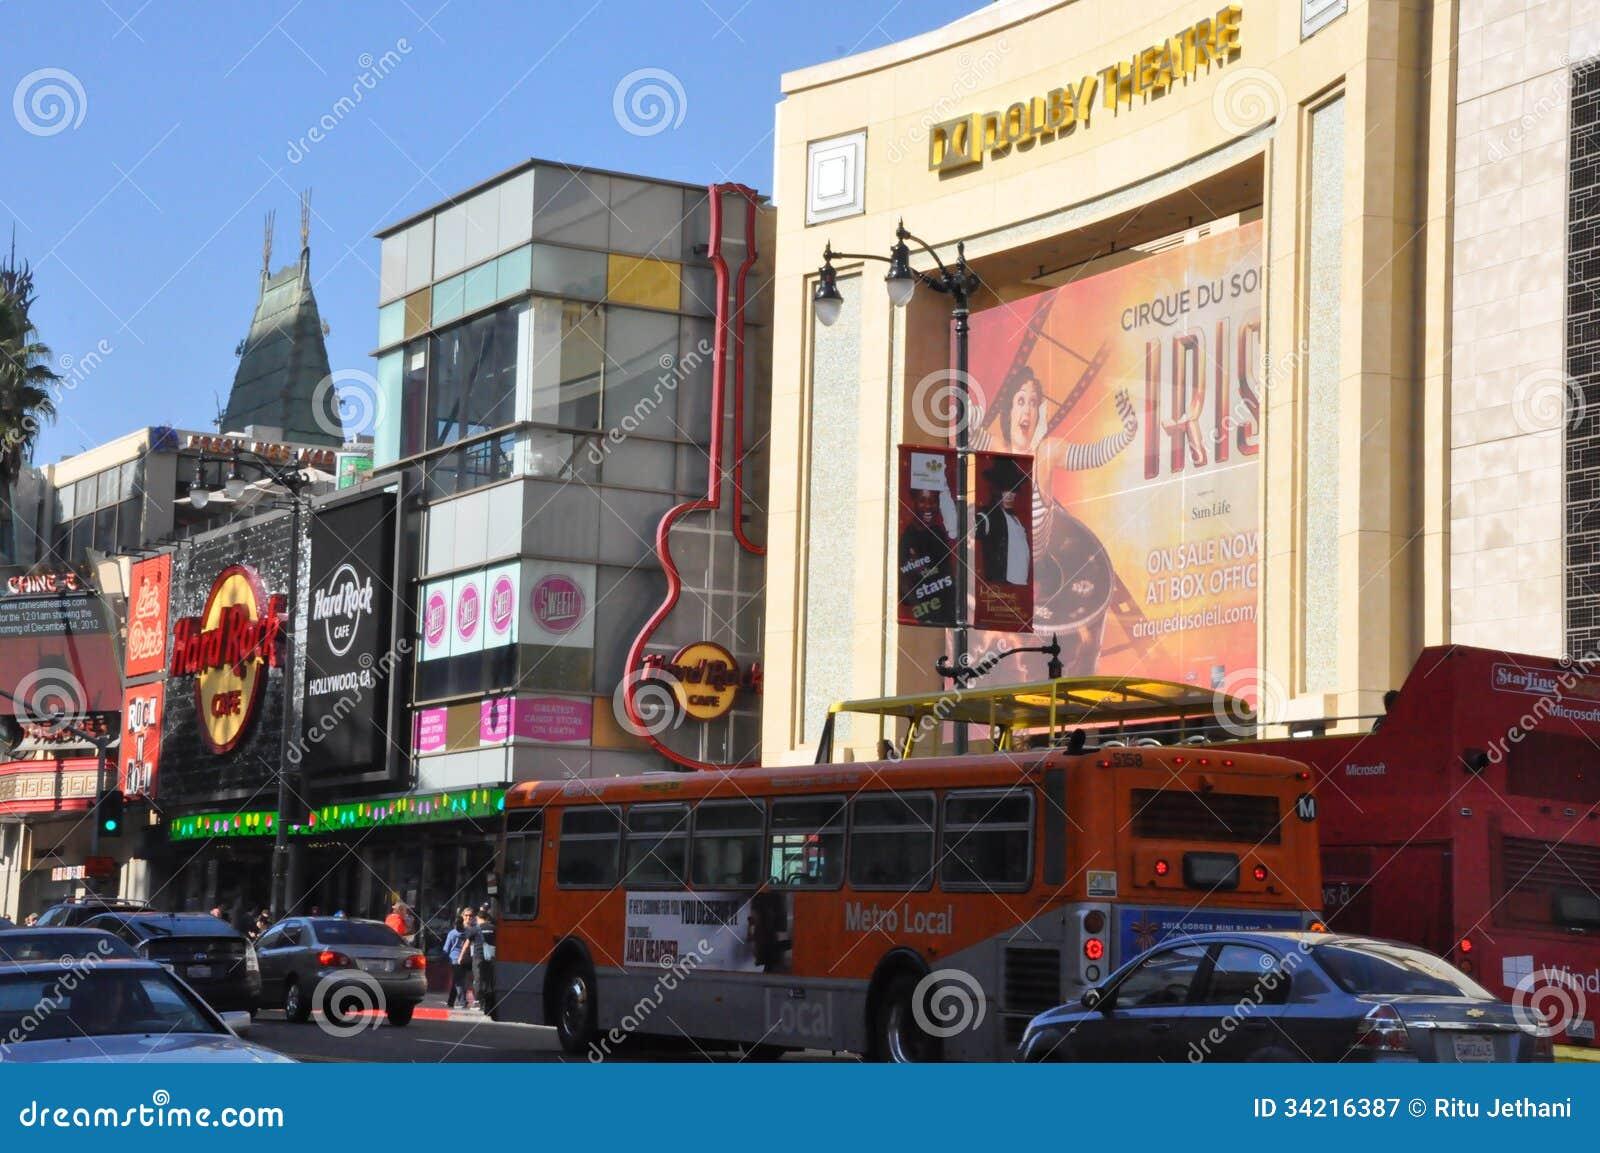 Dolby Theatre w Kalifornia (kodaka Theatre)